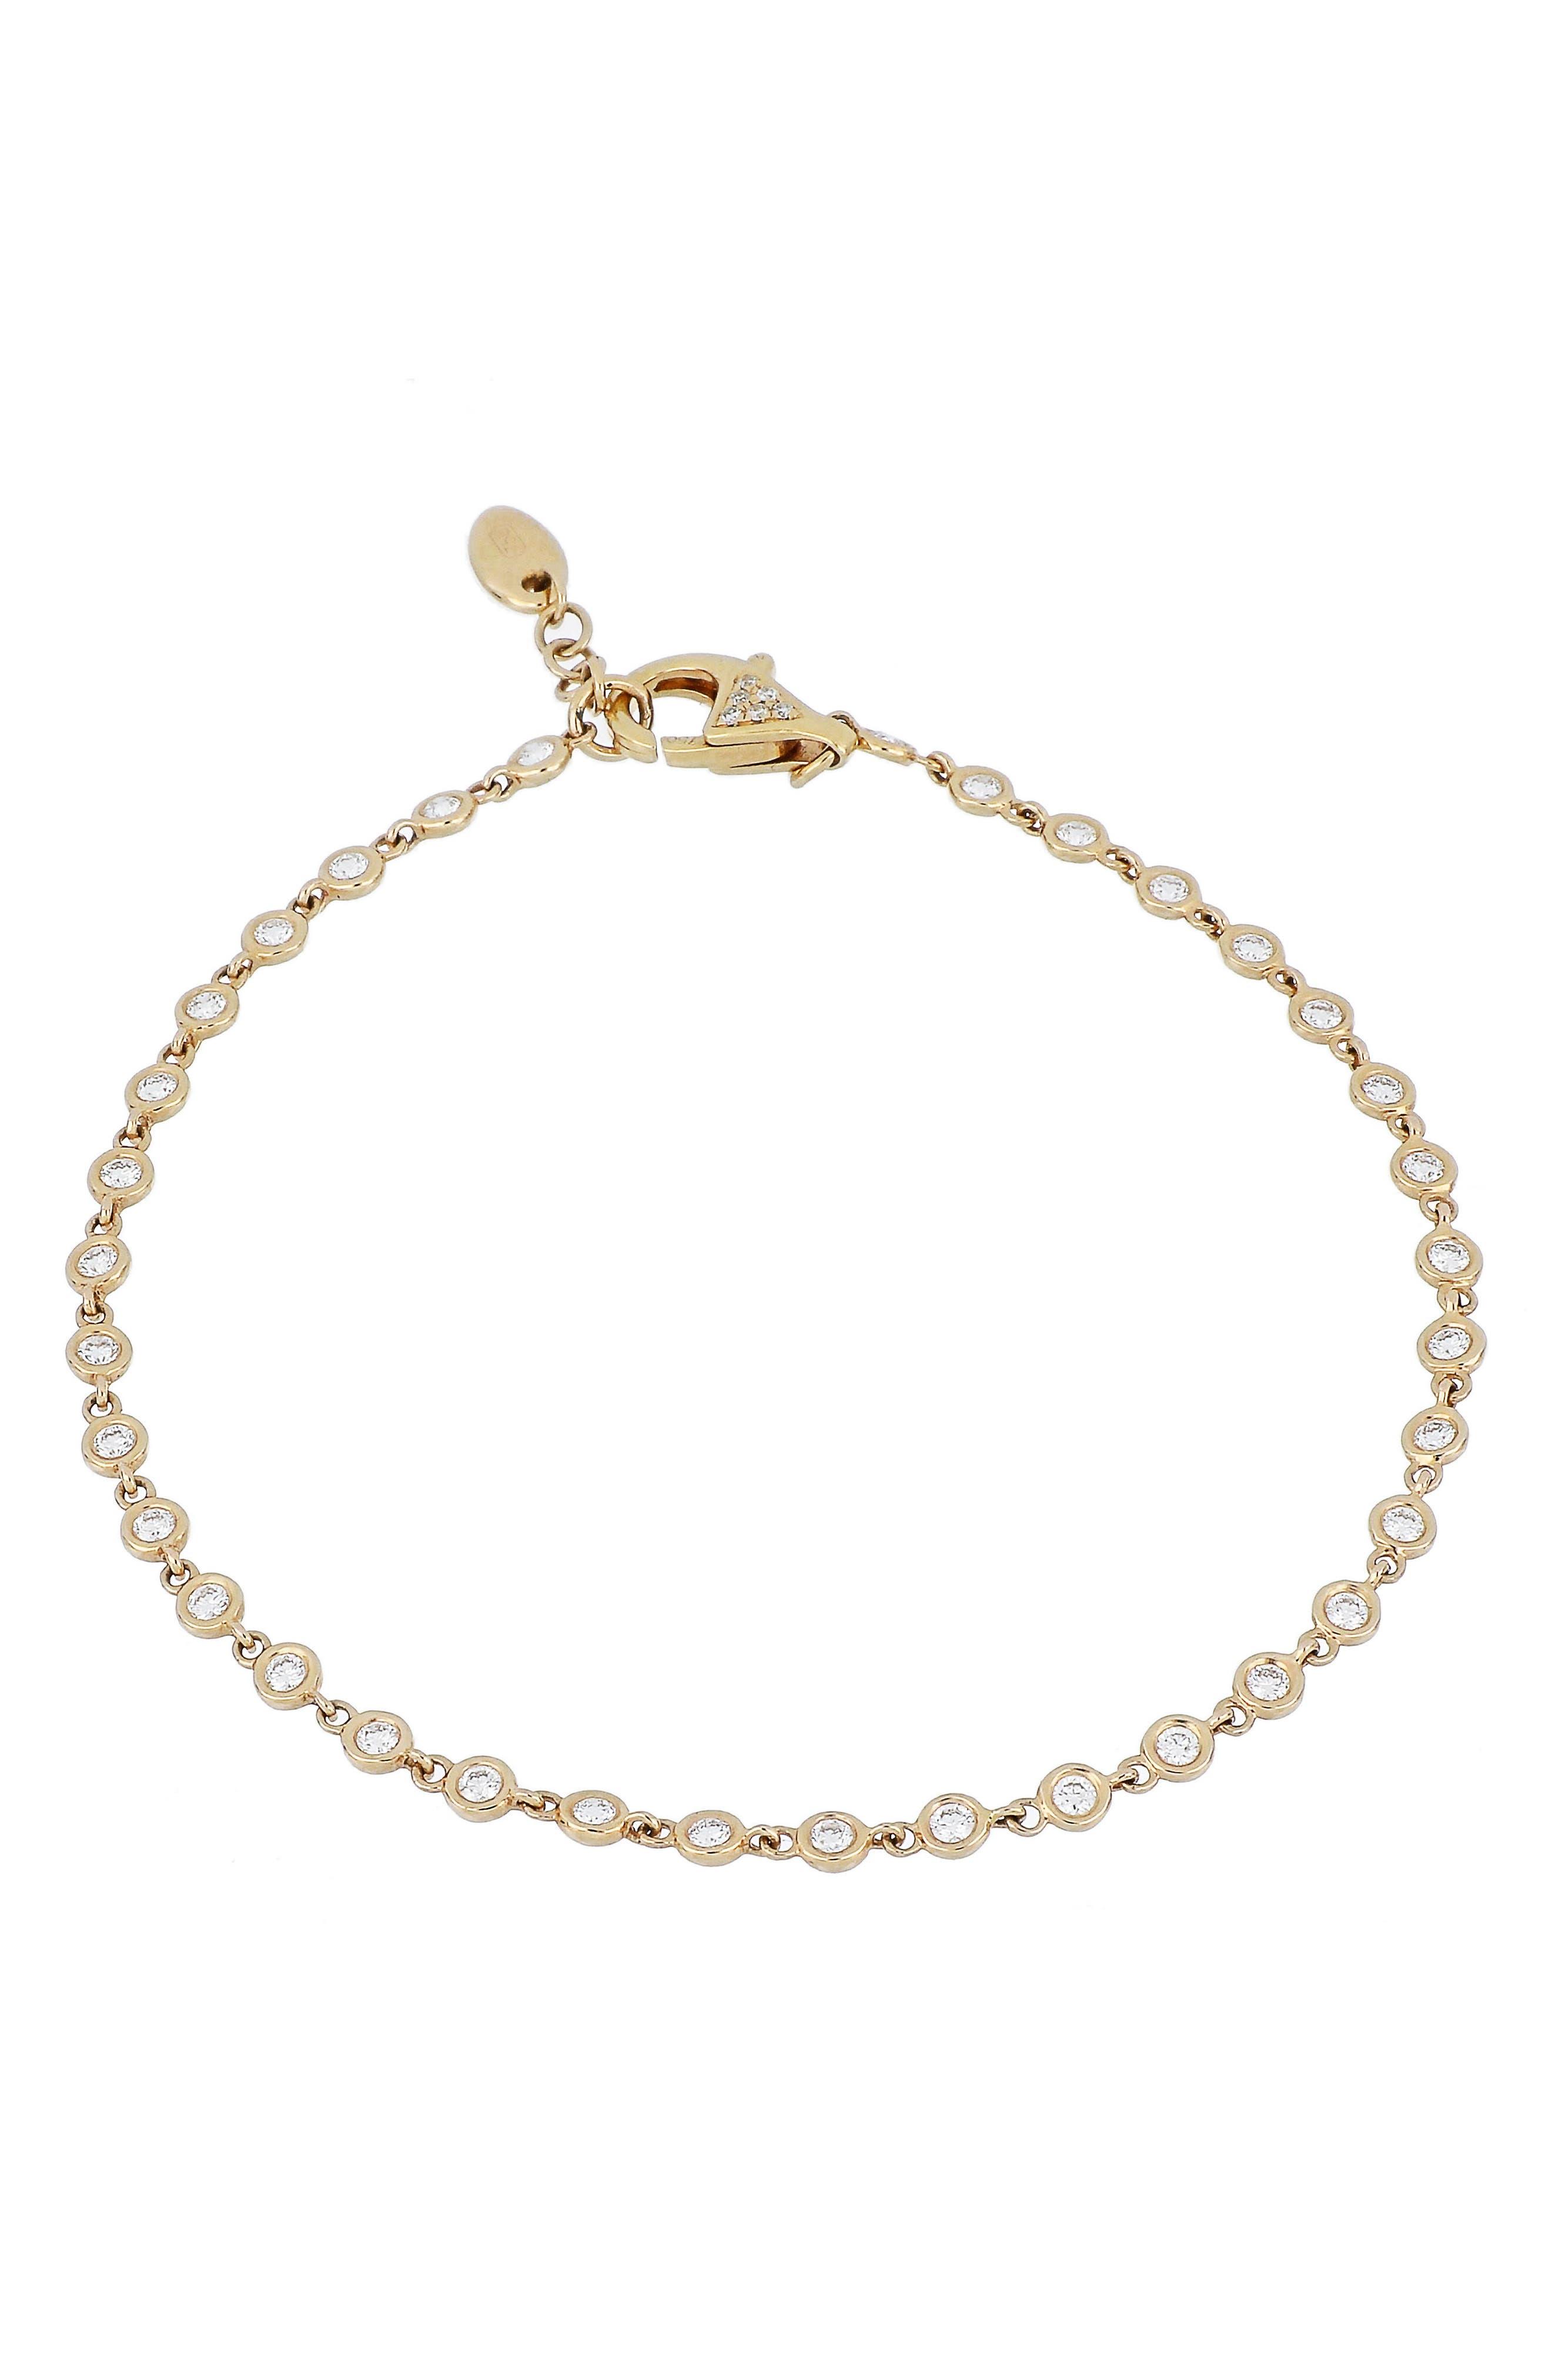 Alternate Image 1 Selected - Bony Levy Diamond Line Bracelet (Nordstrom Exclusive)